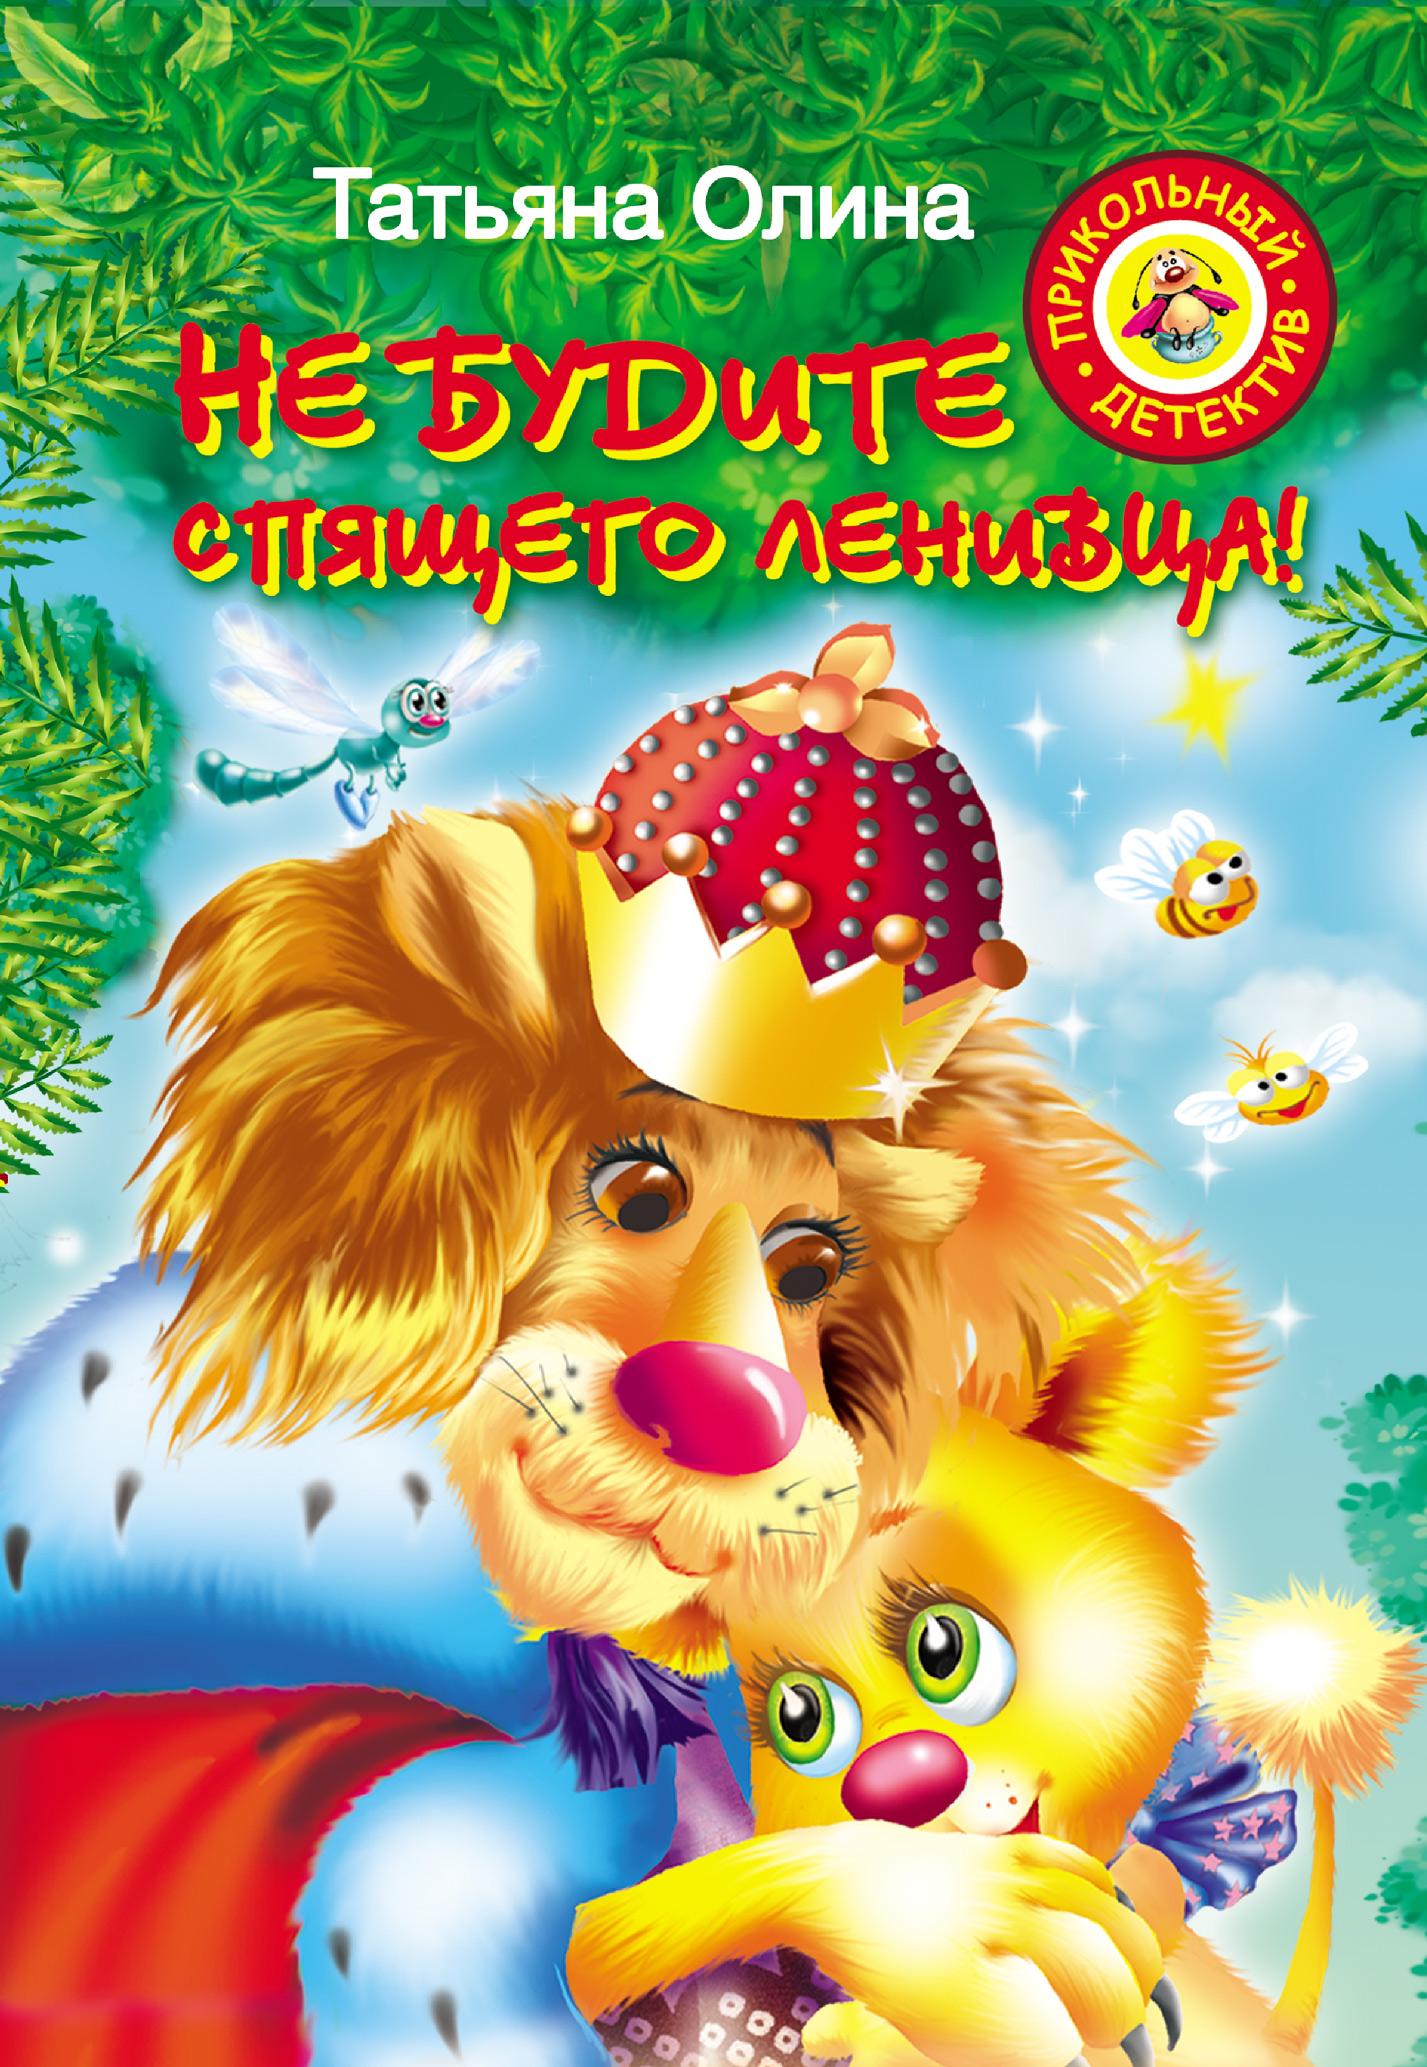 Татьяна Олина Не будите спящего ленивца! алексей егоров небудите спящего титана